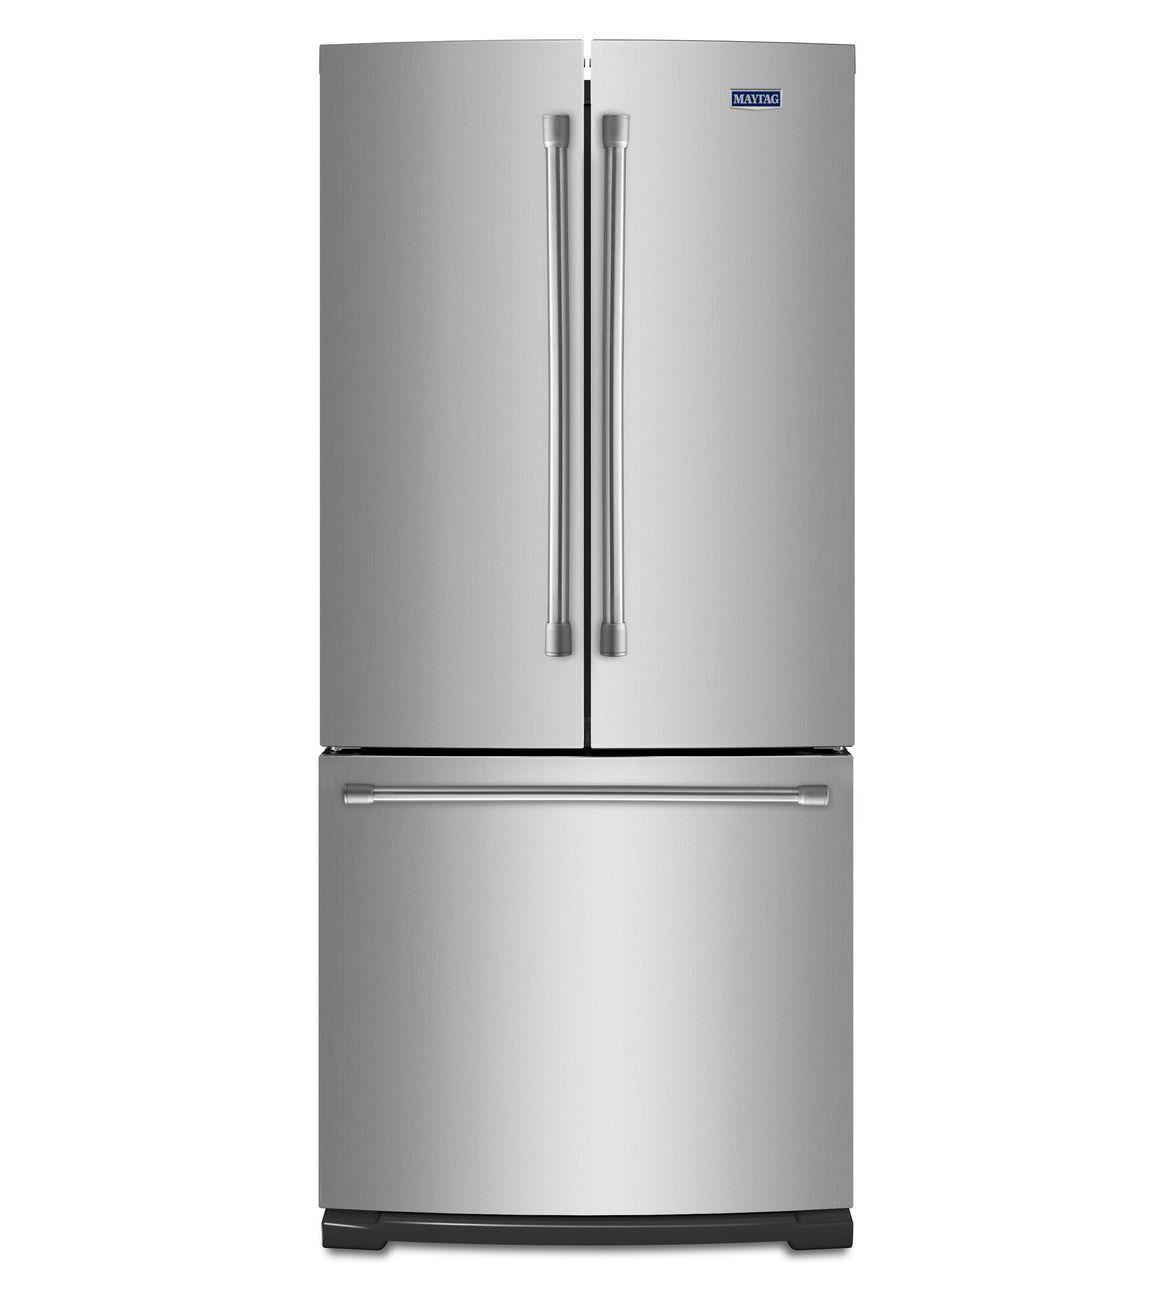 30inch wide french door refrigerator 20 cu ft